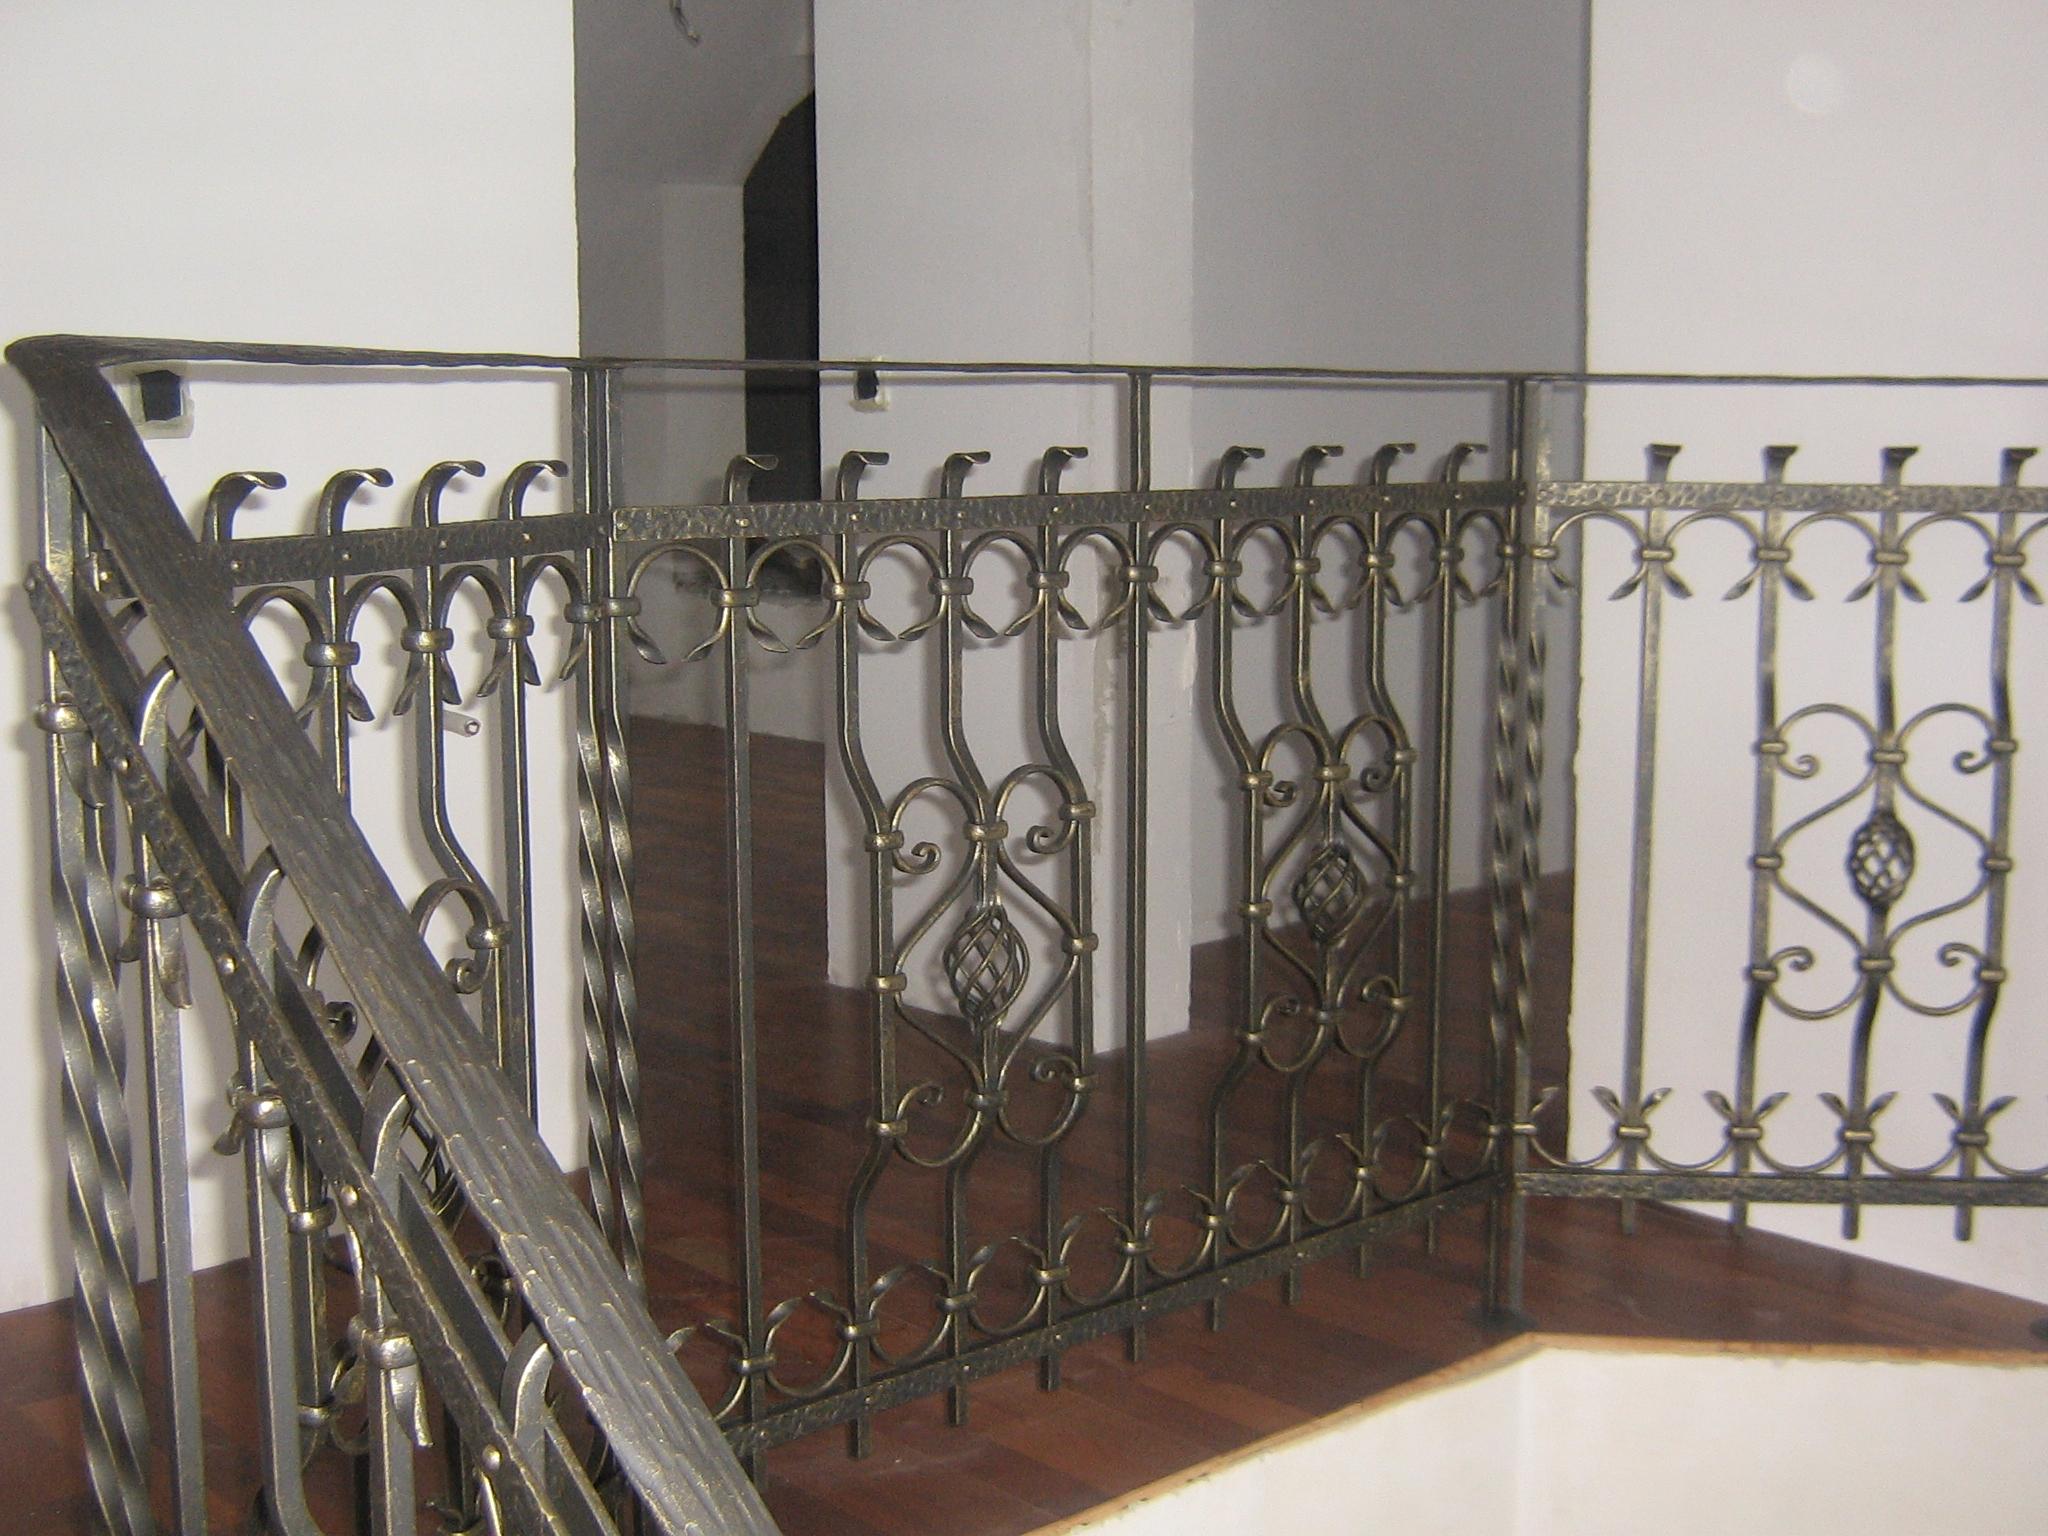 balustrada-dąbrówka-006-1024x768